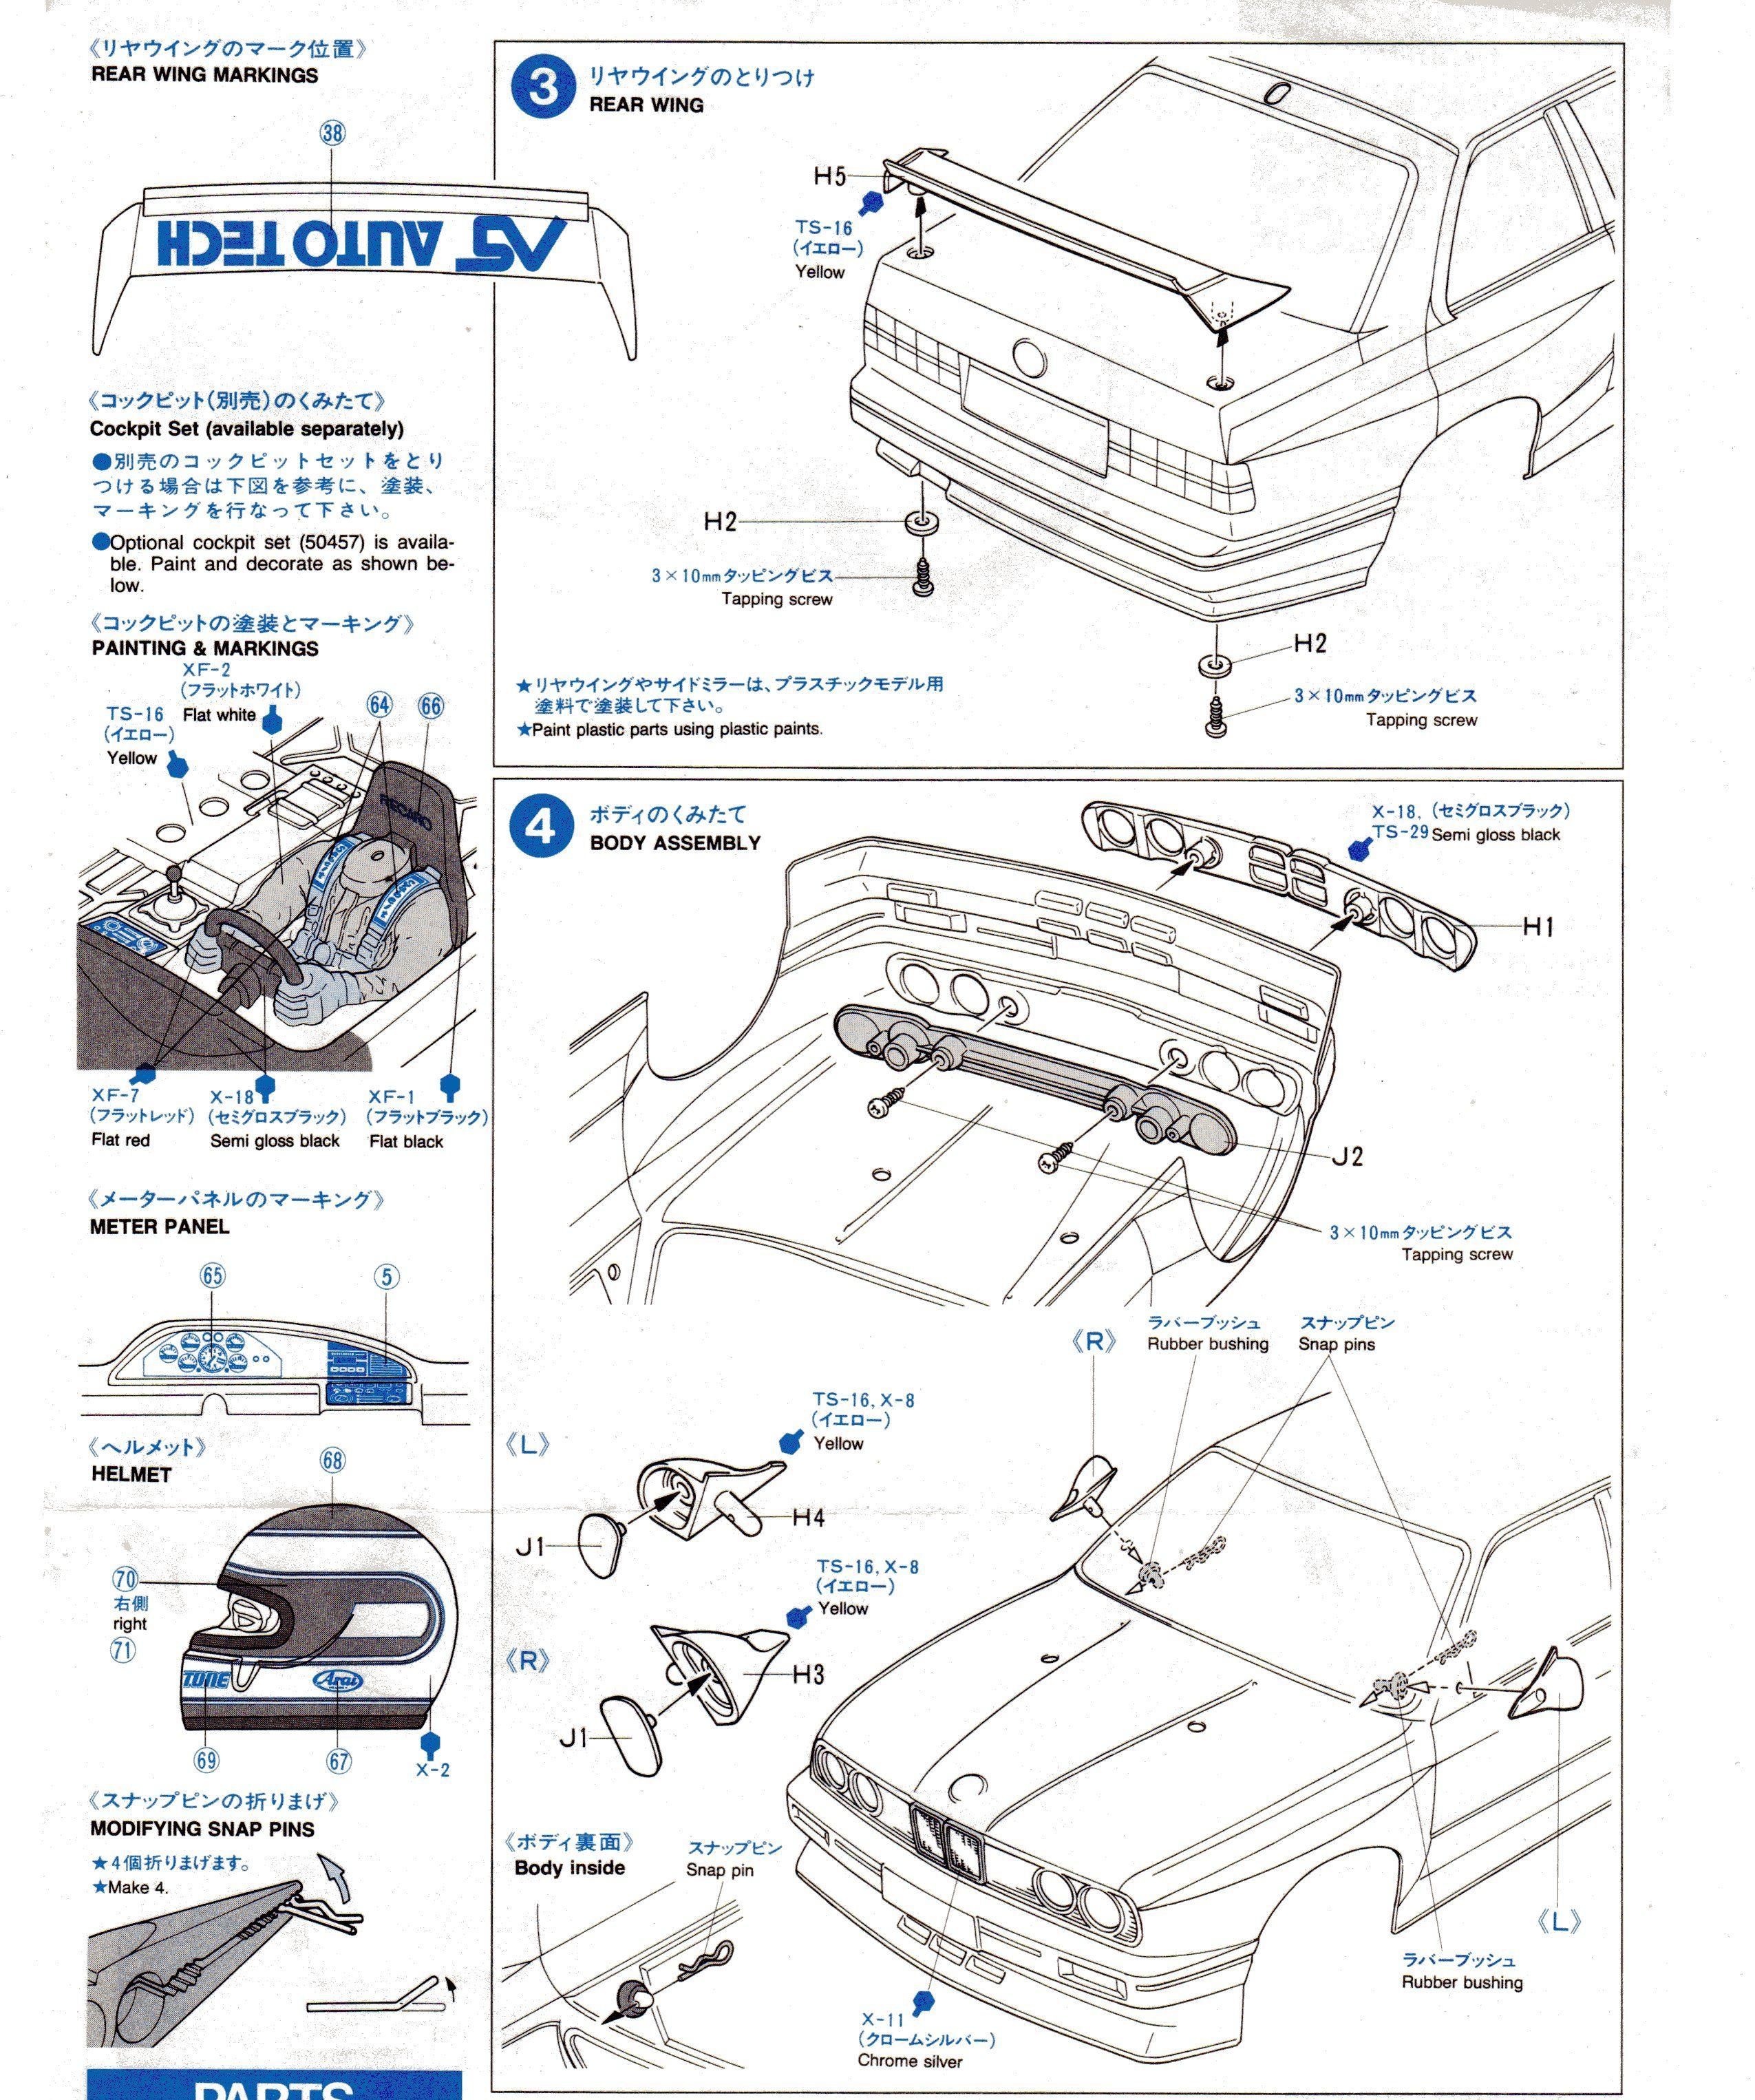 Instructions For Mercedes 190e Berlin 2000 Bmw M3 Auto Tech List Moulding Chrome 10mm Body Interior 50483c